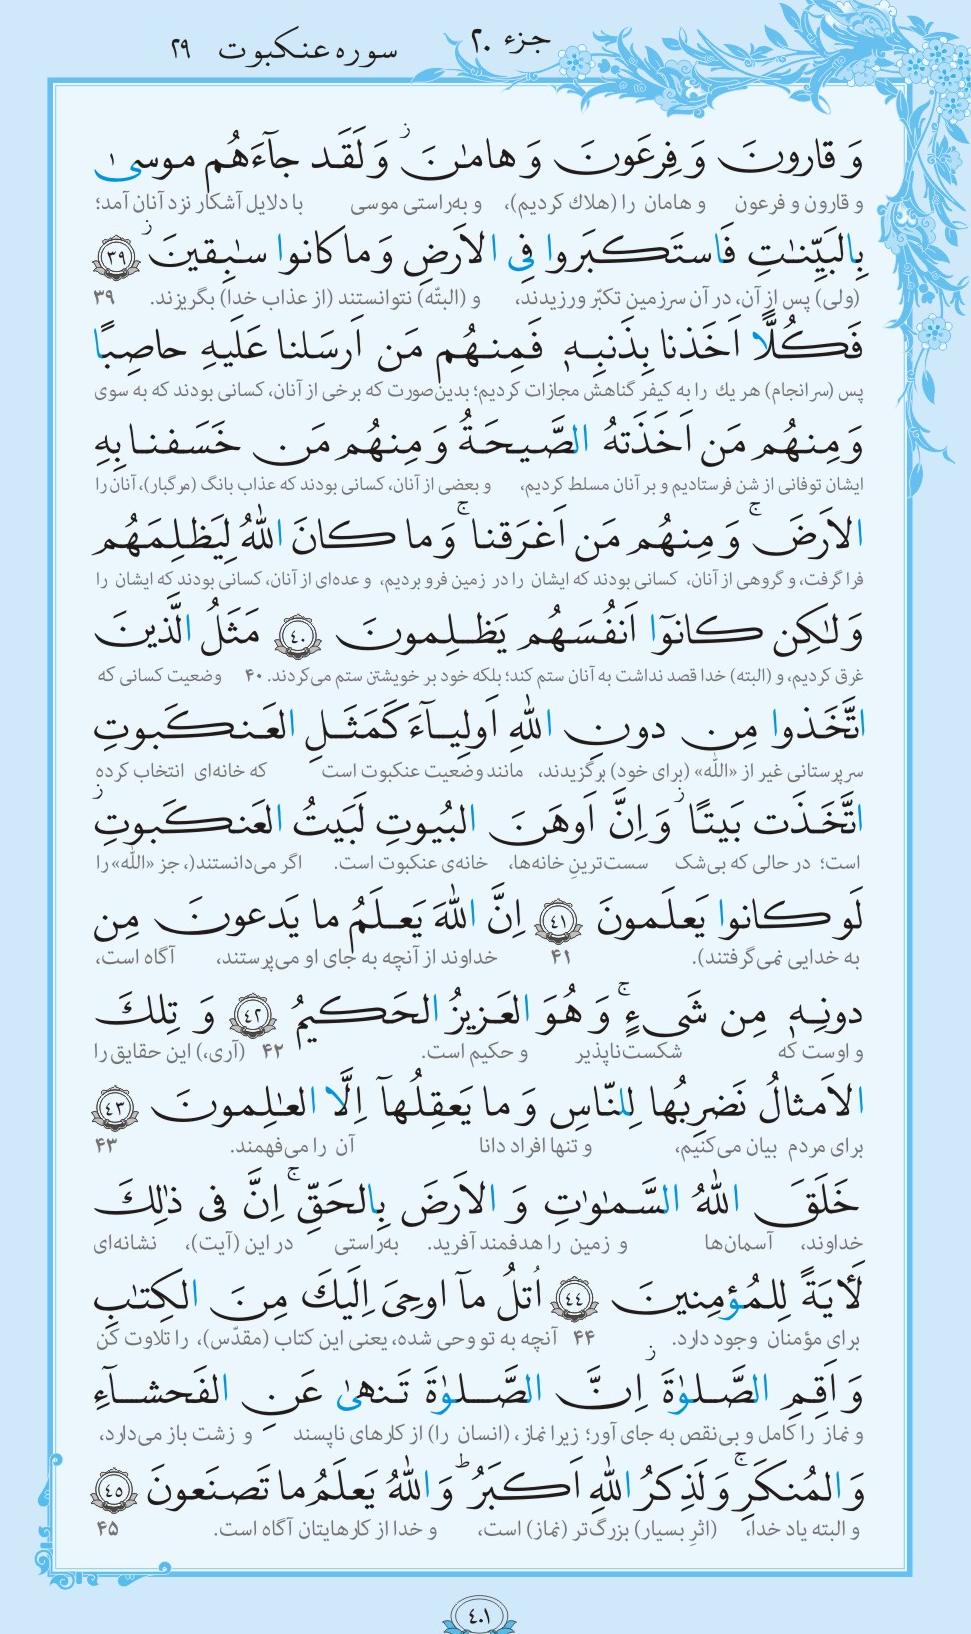 13990404000960 Test NewPhotoFree - ترتیل صفحه ۴۰۱ قرآن باصدای مصطفی اسماعیل+صوت و متن